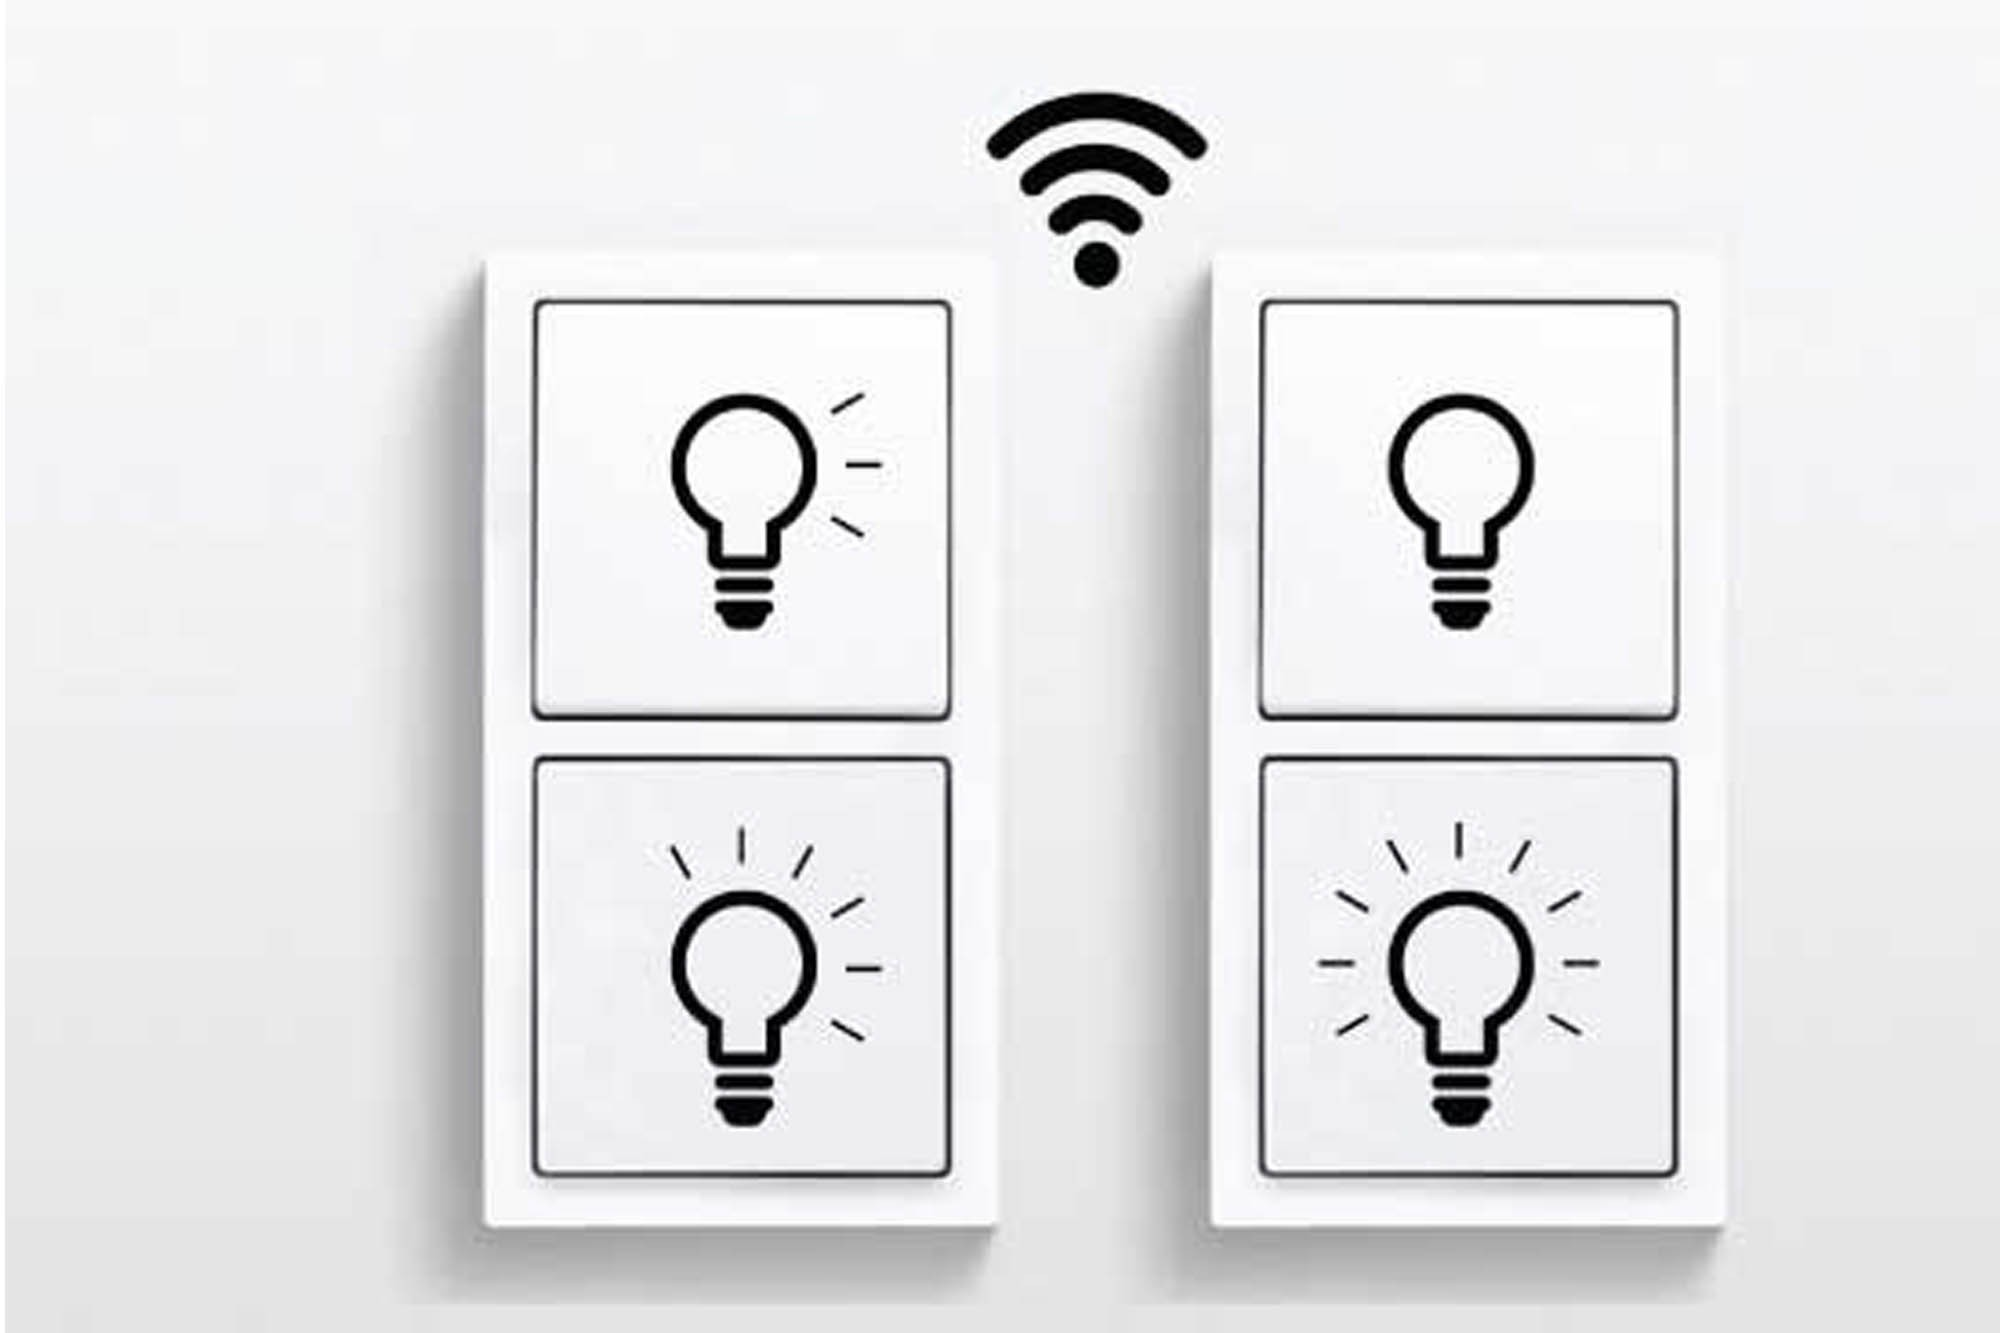 Smart switchgears